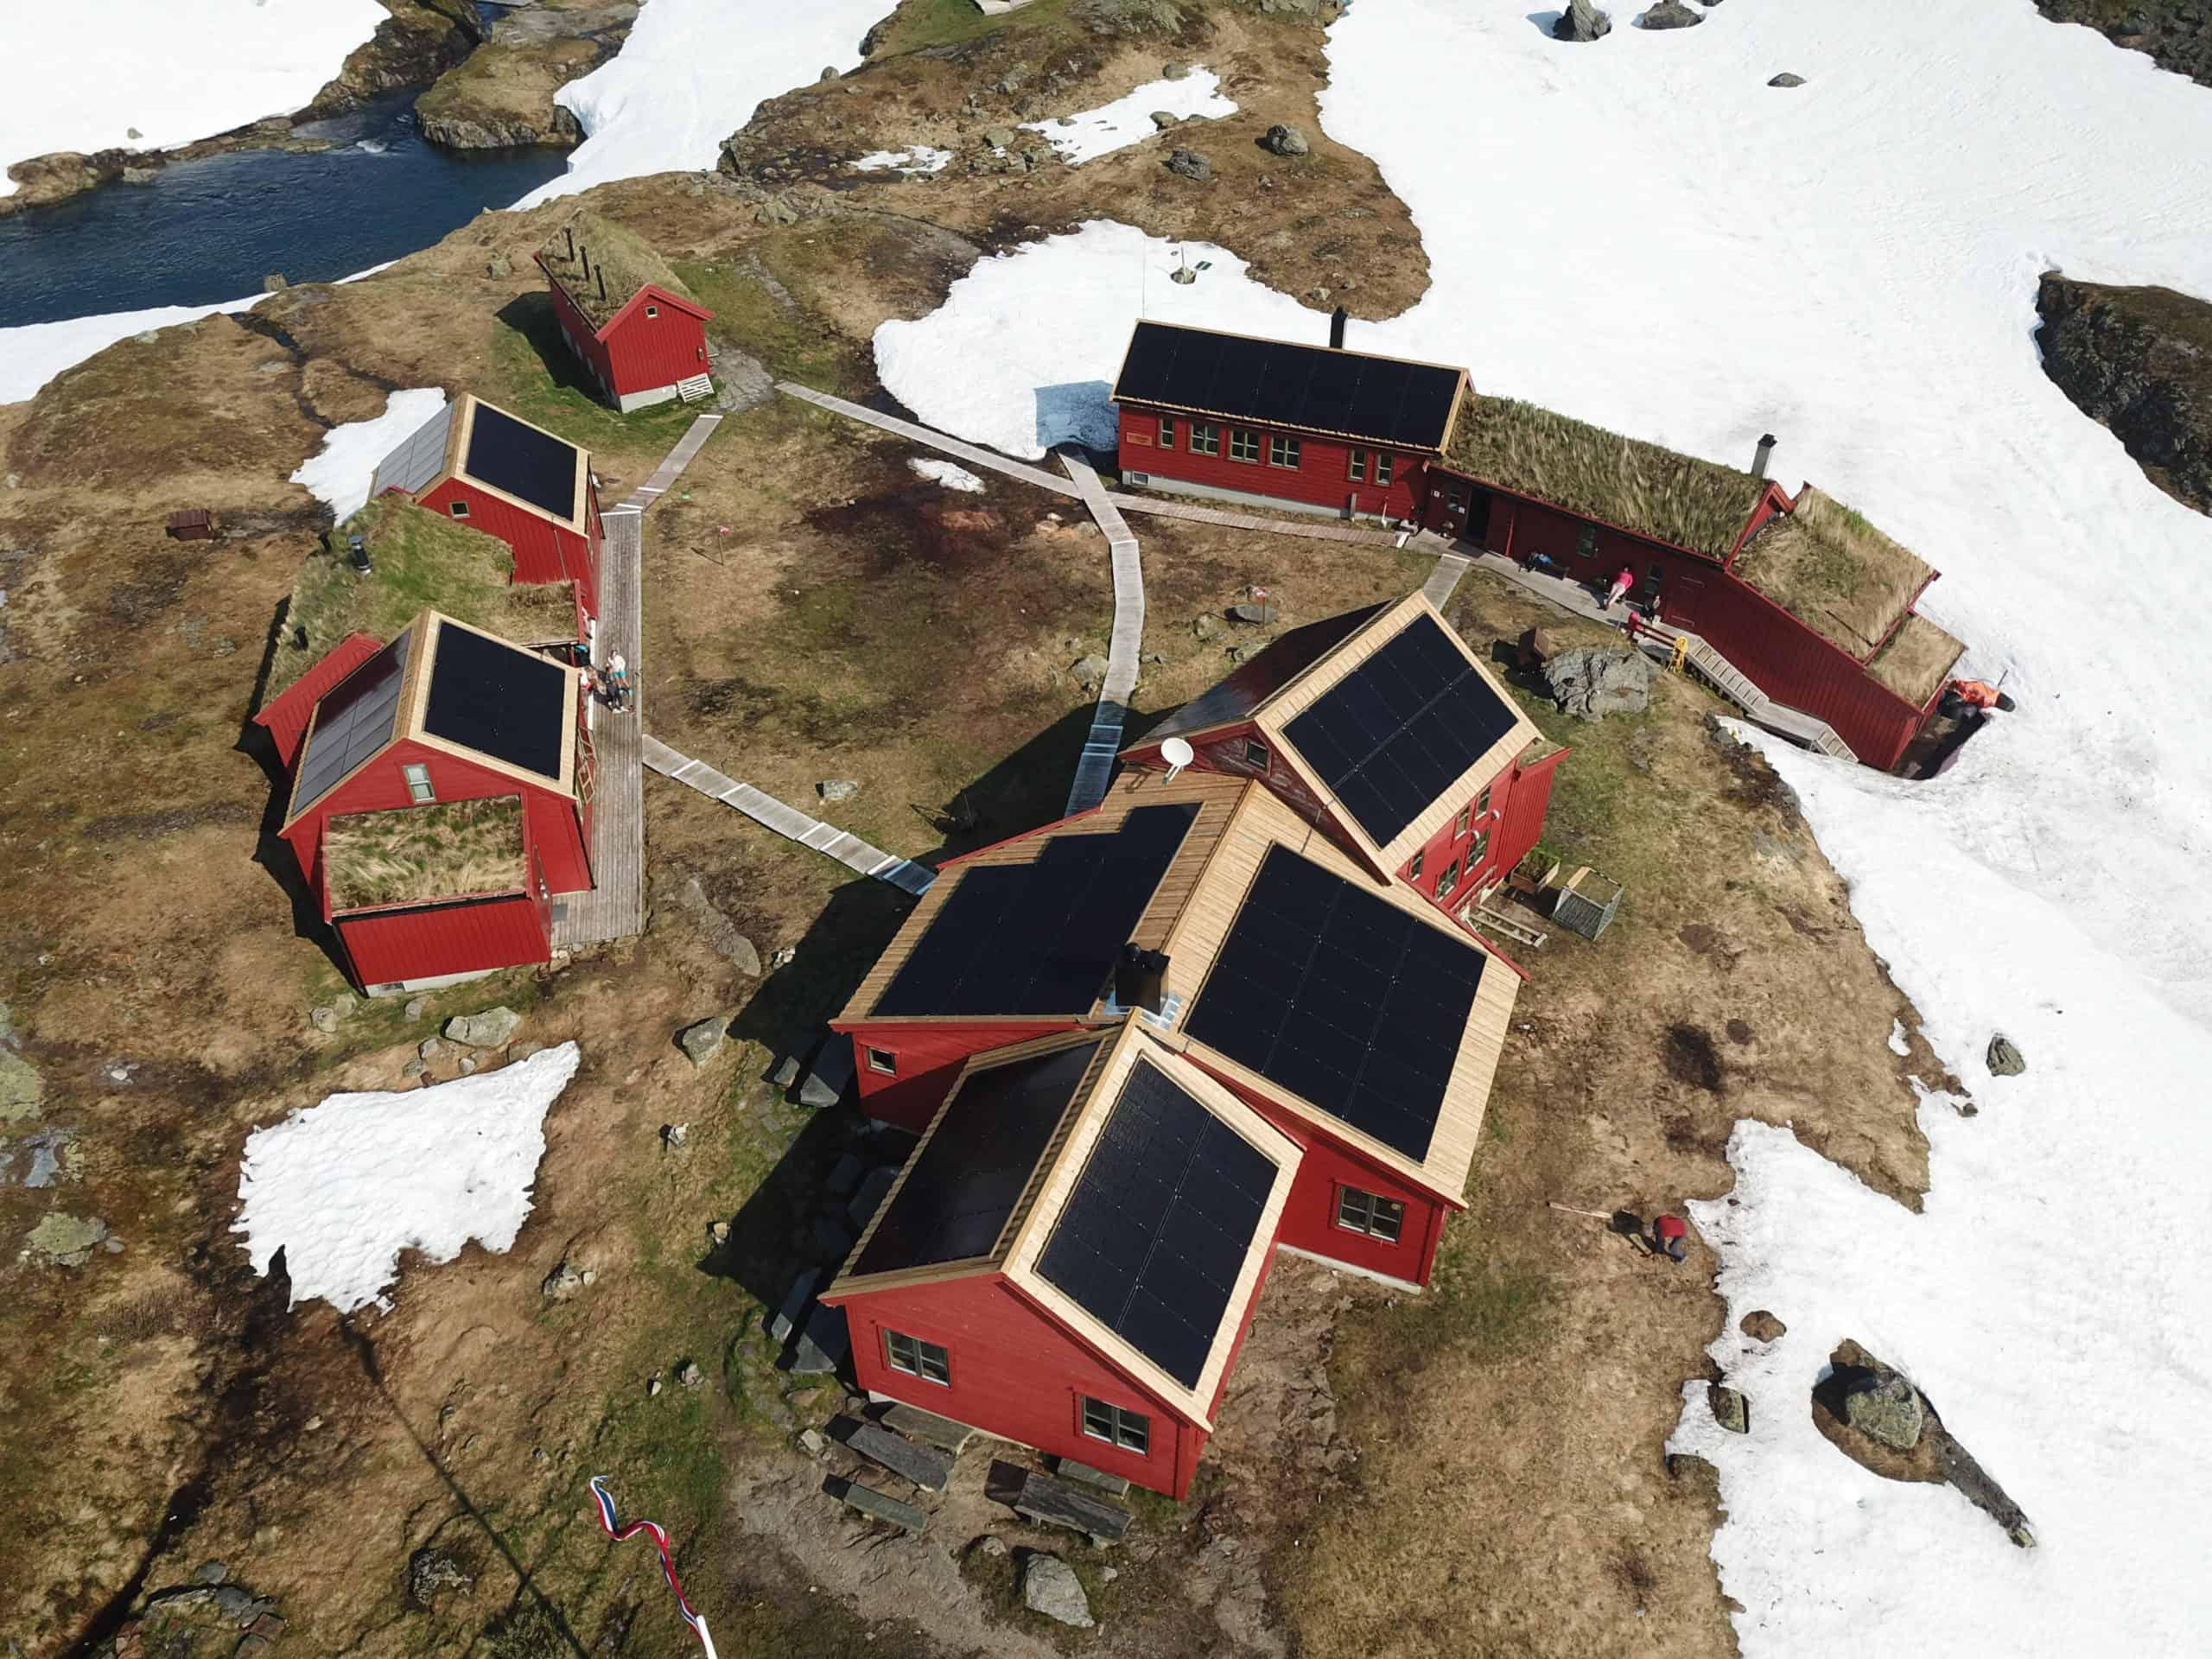 Stranddalen Turisthytte / Stavanger turistforening